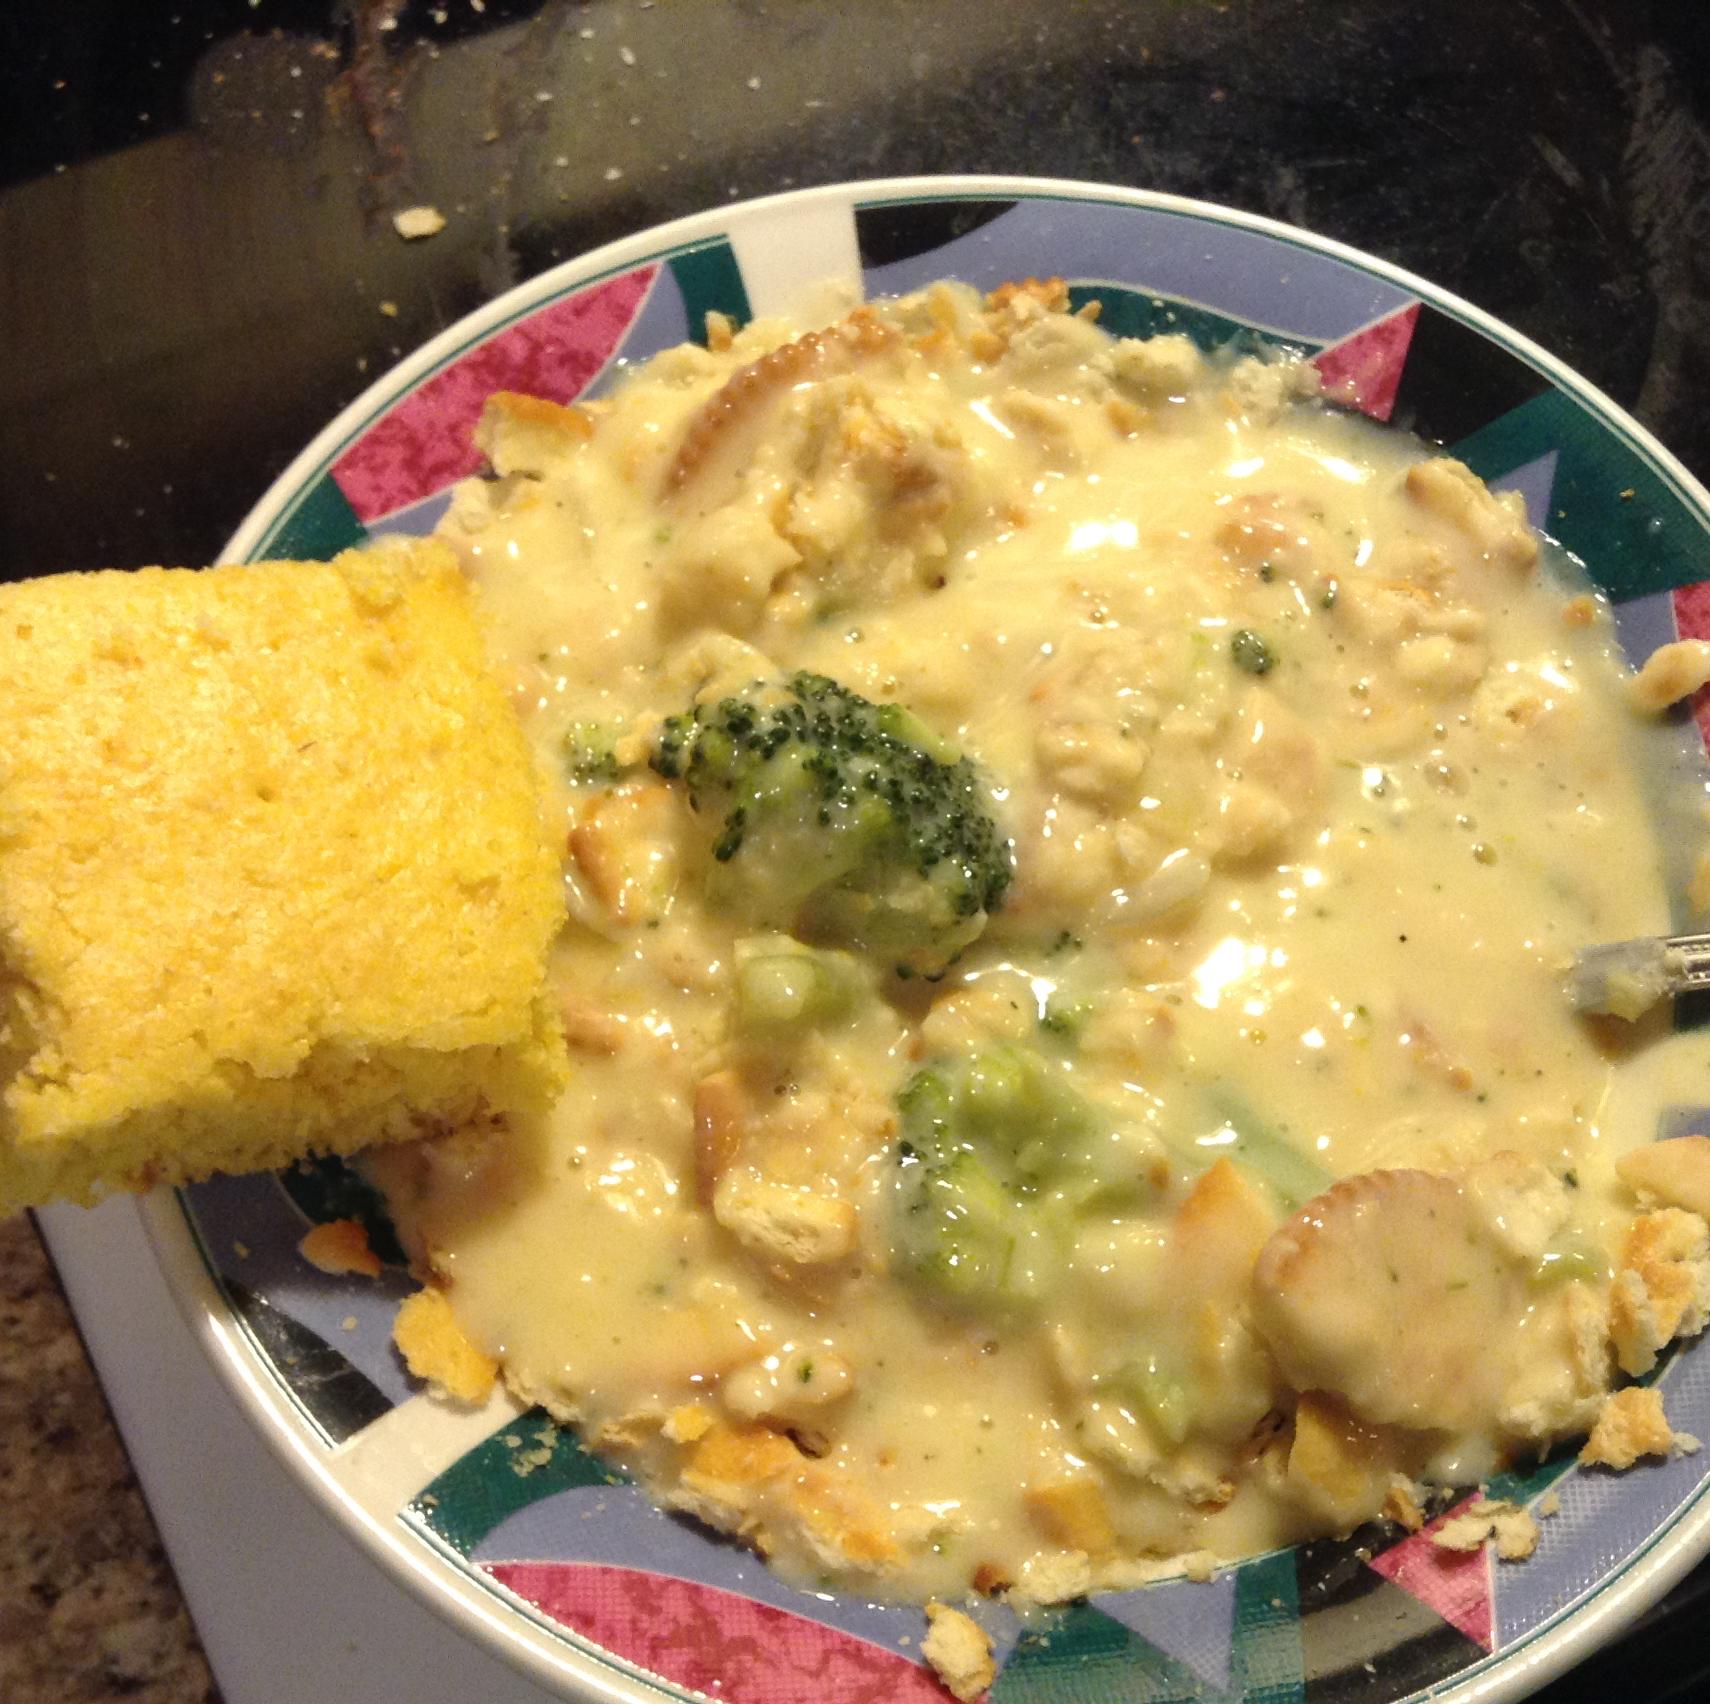 Broccoli Cheese Soup Alicia Faw Clary